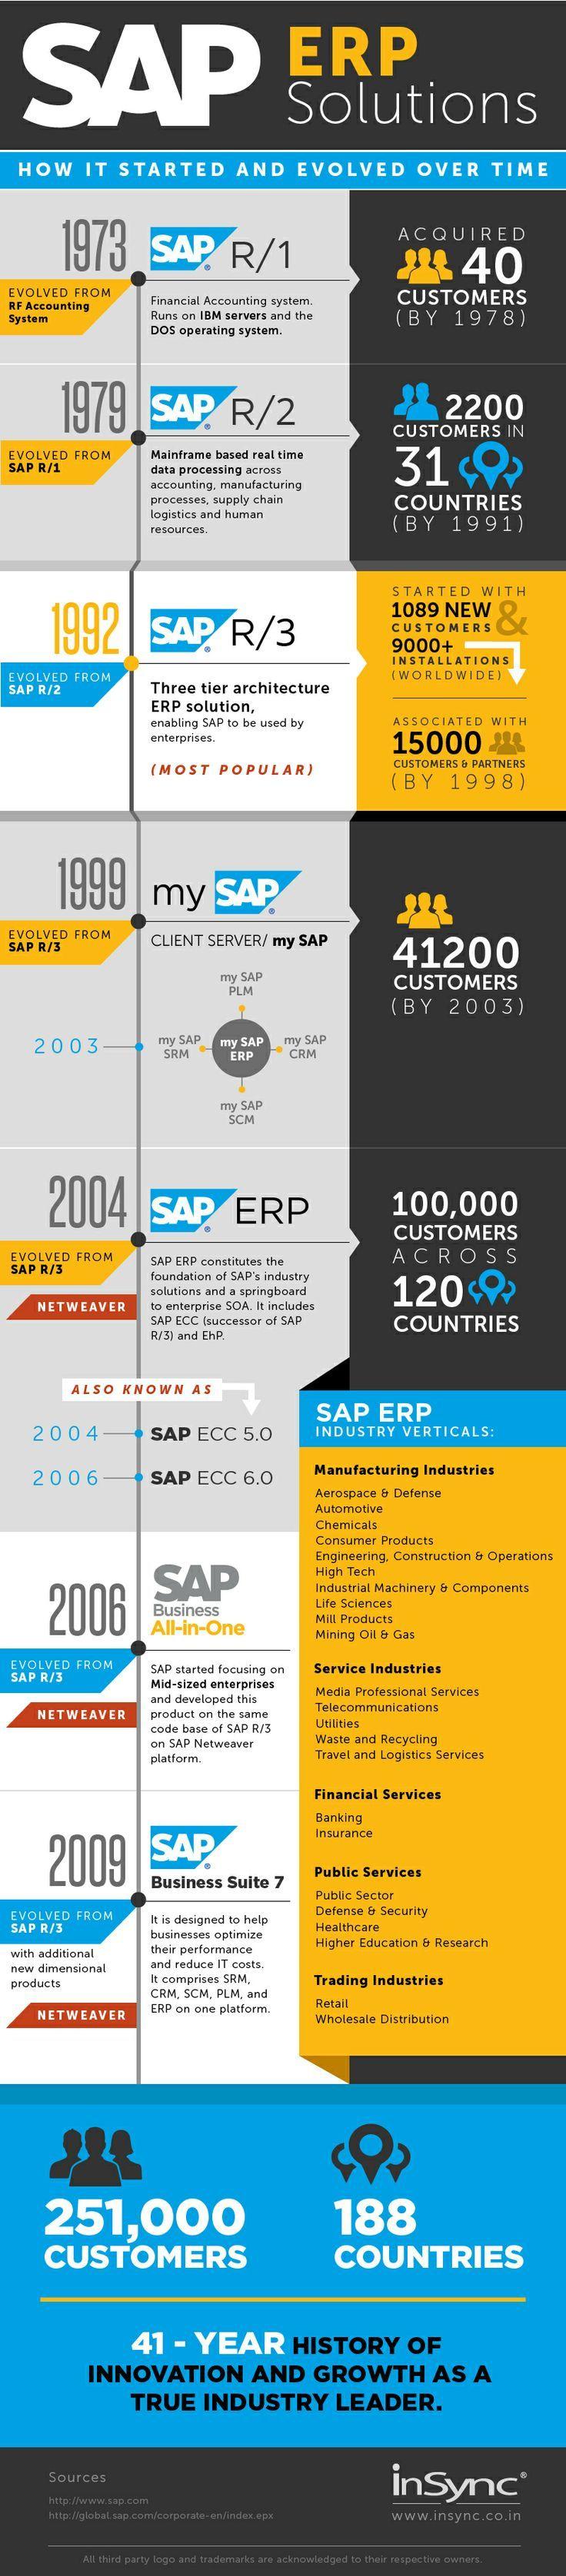 SAP historie